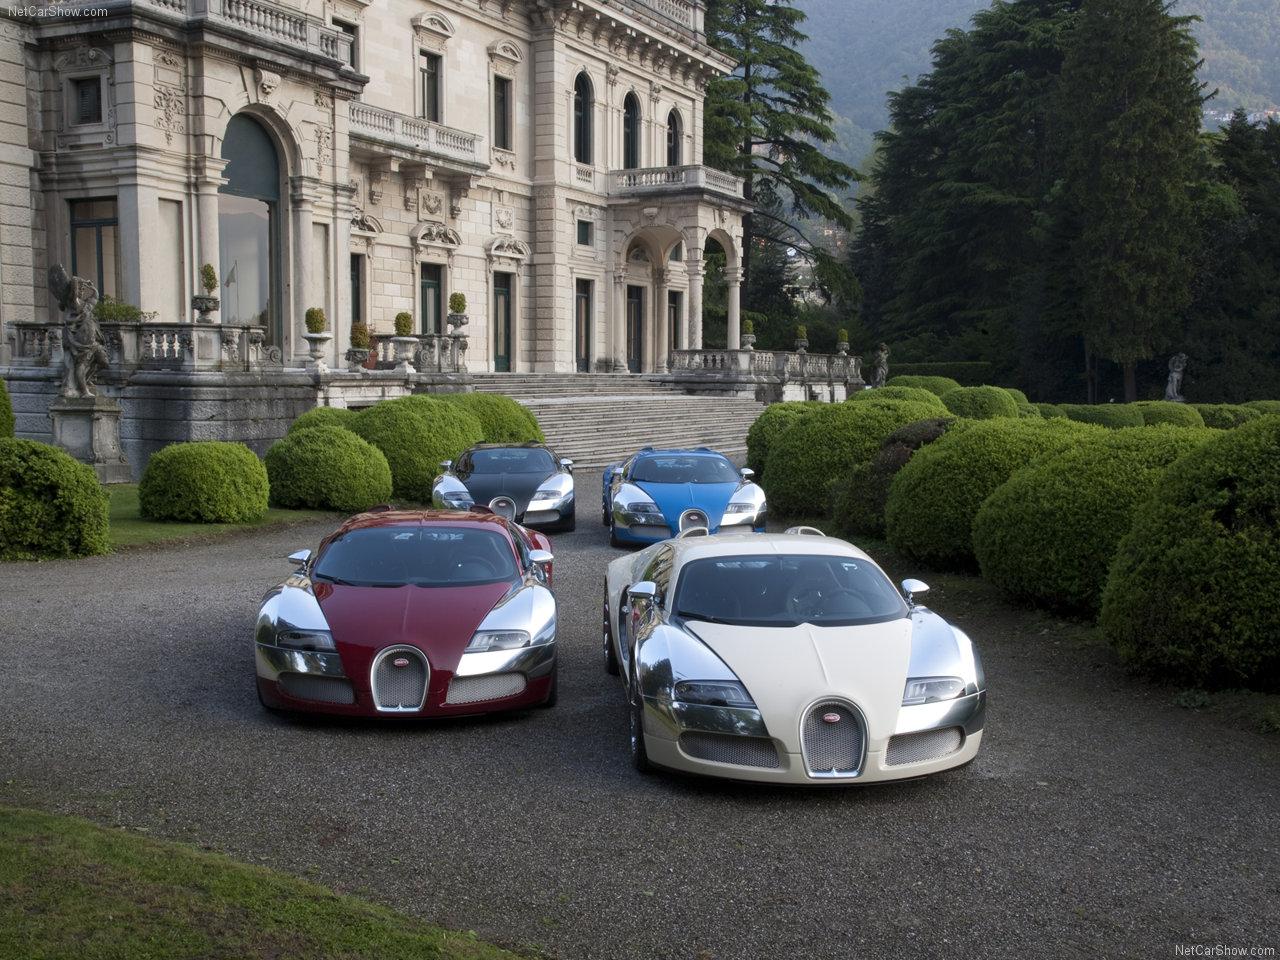 http://4.bp.blogspot.com/_k-uzaP4Gx6M/Sj-lTRlB3wI/AAAAAAAAFwU/vqAs4uFlJZQ/s1600/Bugatti-Veyron_Centenaire_2009_1280x960_wallpaper_05.jpg